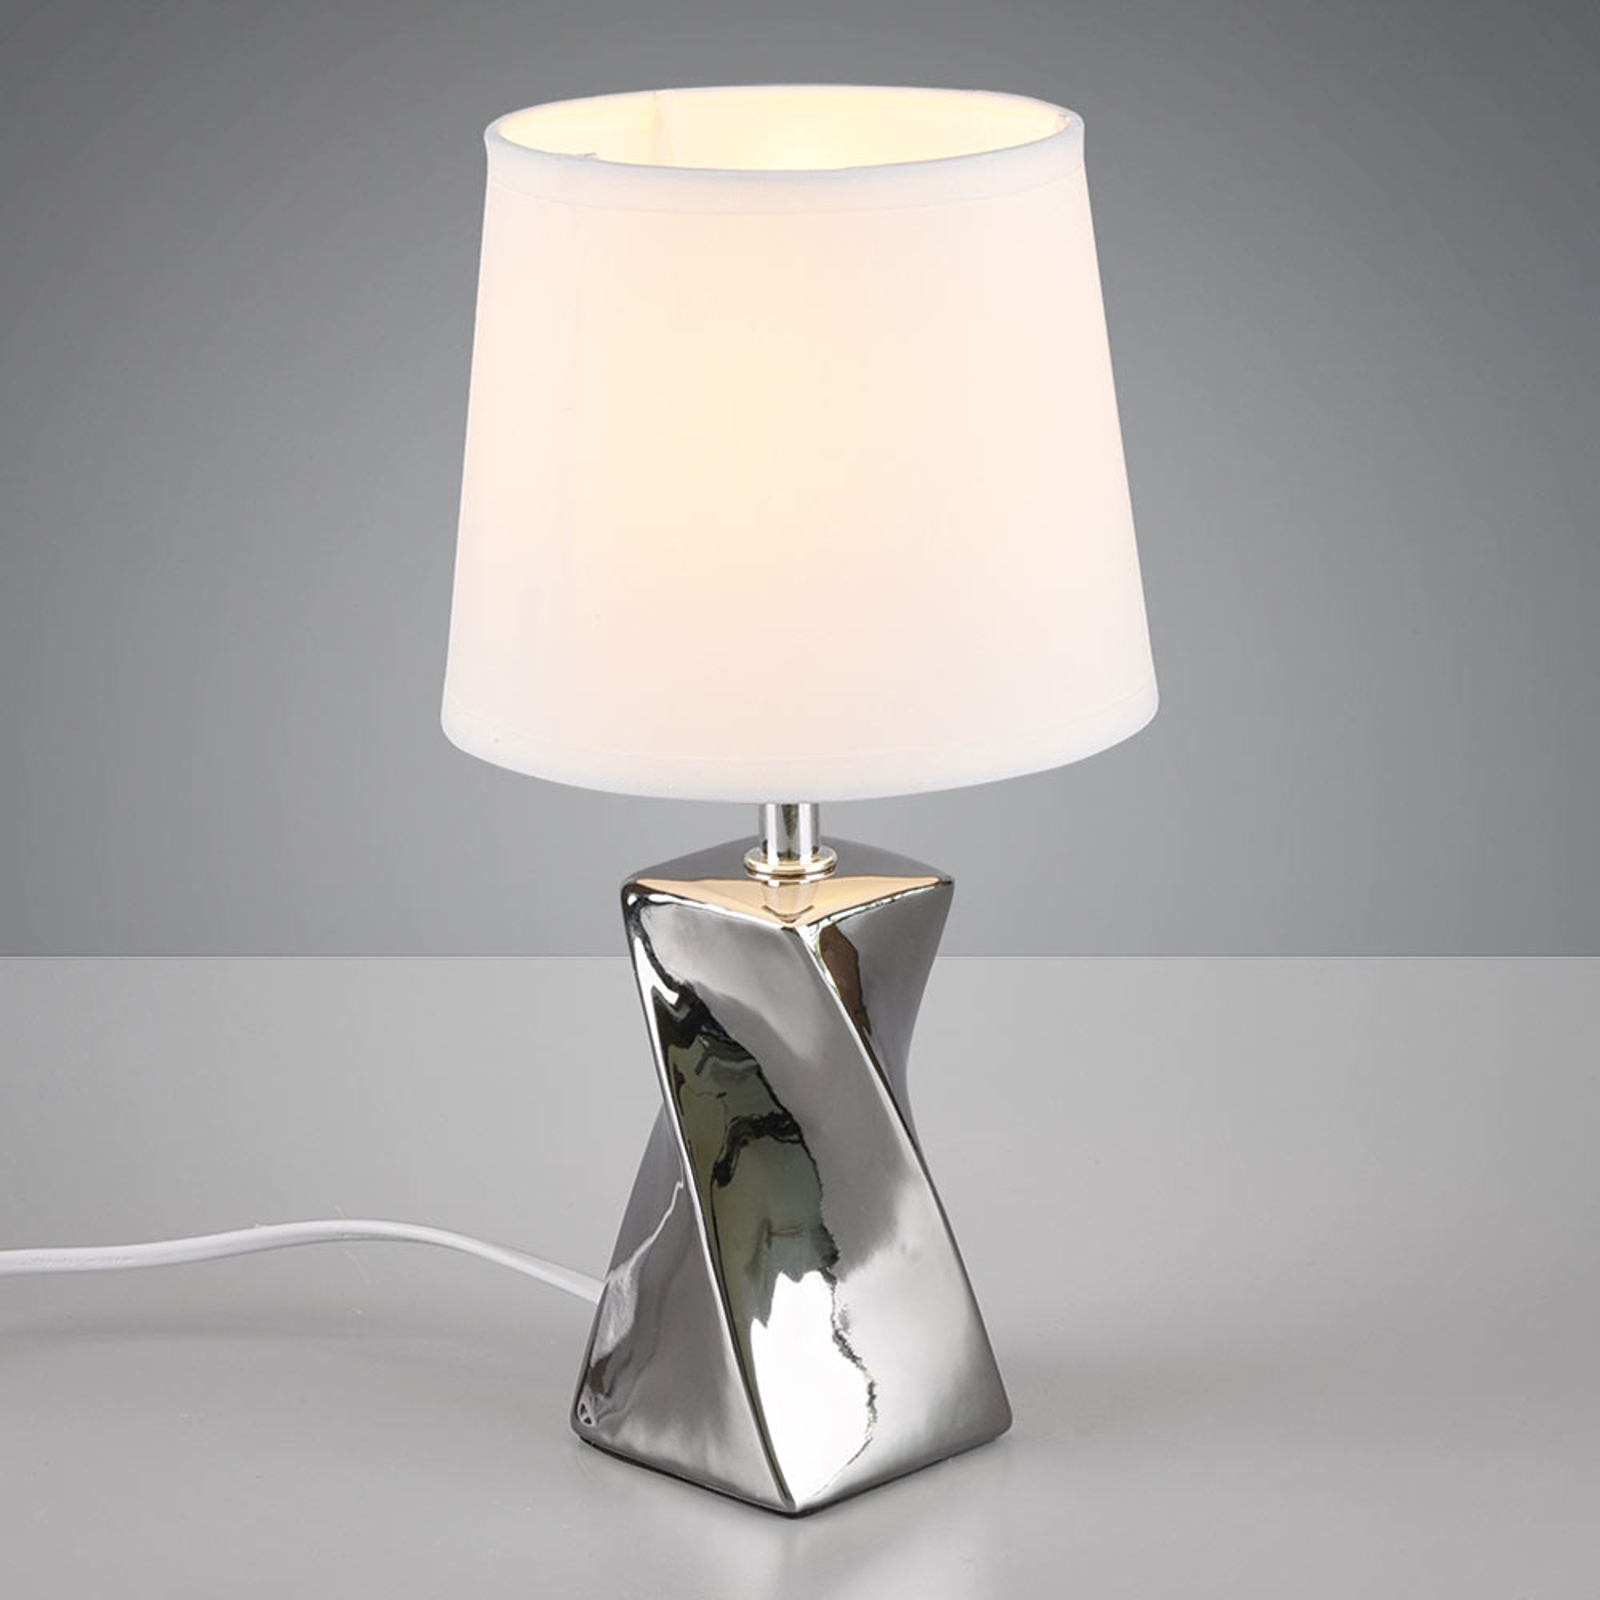 Pöytälamppu Abeba, Ø 15 cm, valkoinen-hopea